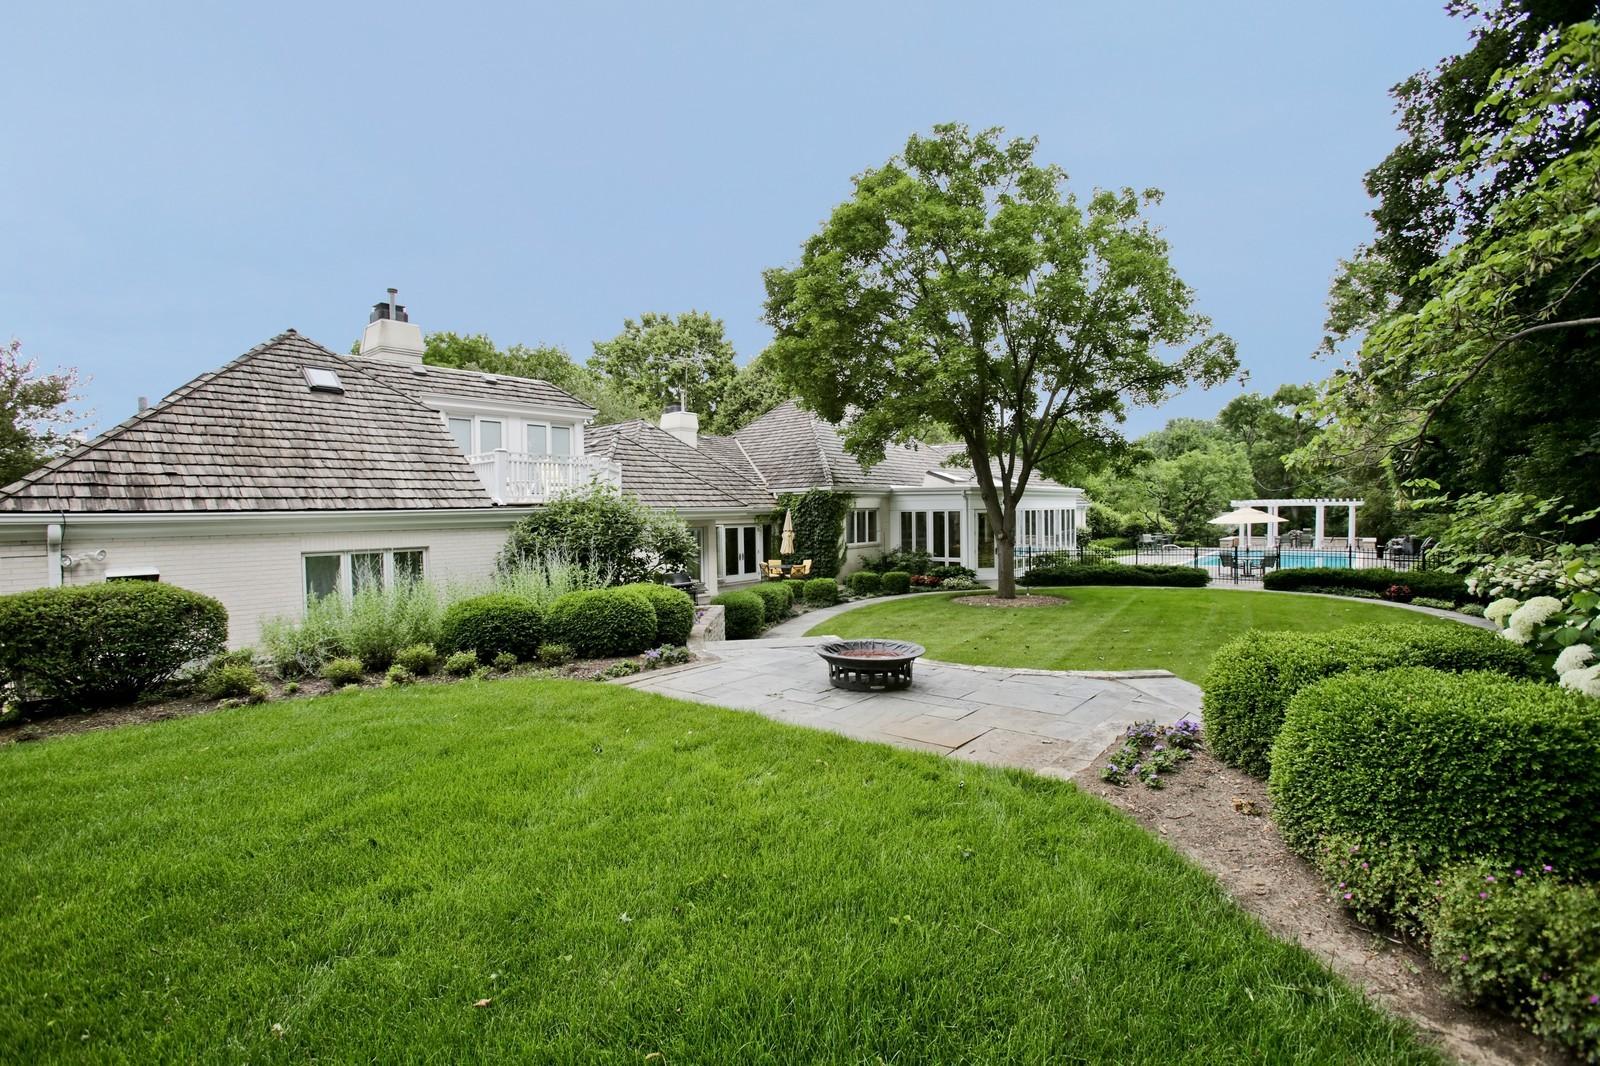 Real Estate Photography - 25W445 Plamondon Rd, Wheaton, IL, 60189 - South end of back yard